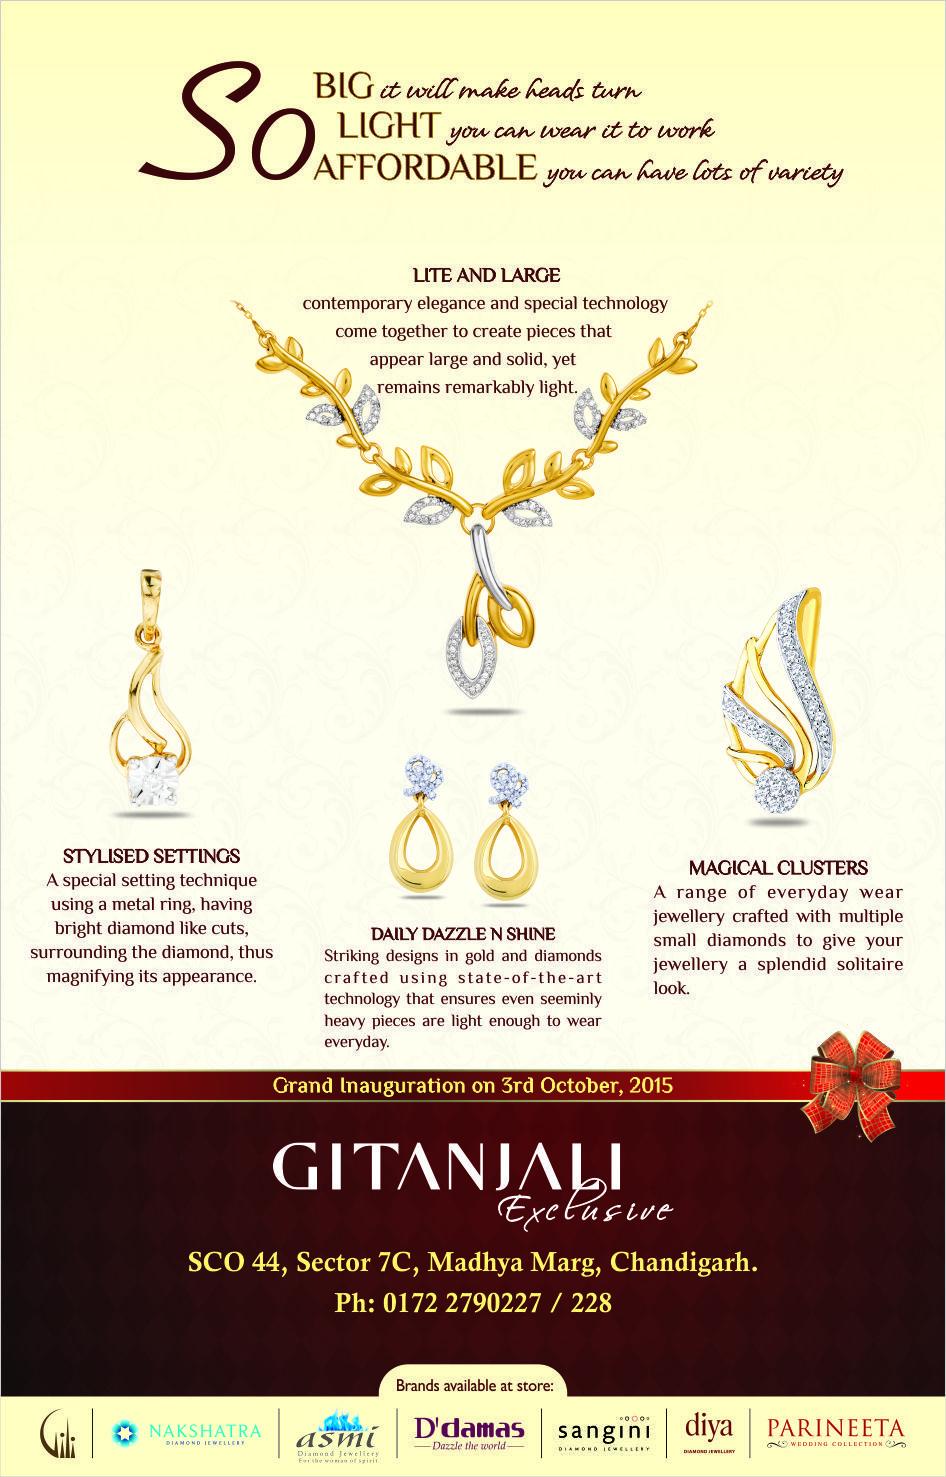 Pin by Vishal Shah on My Portfolio Gold jewelry, Create